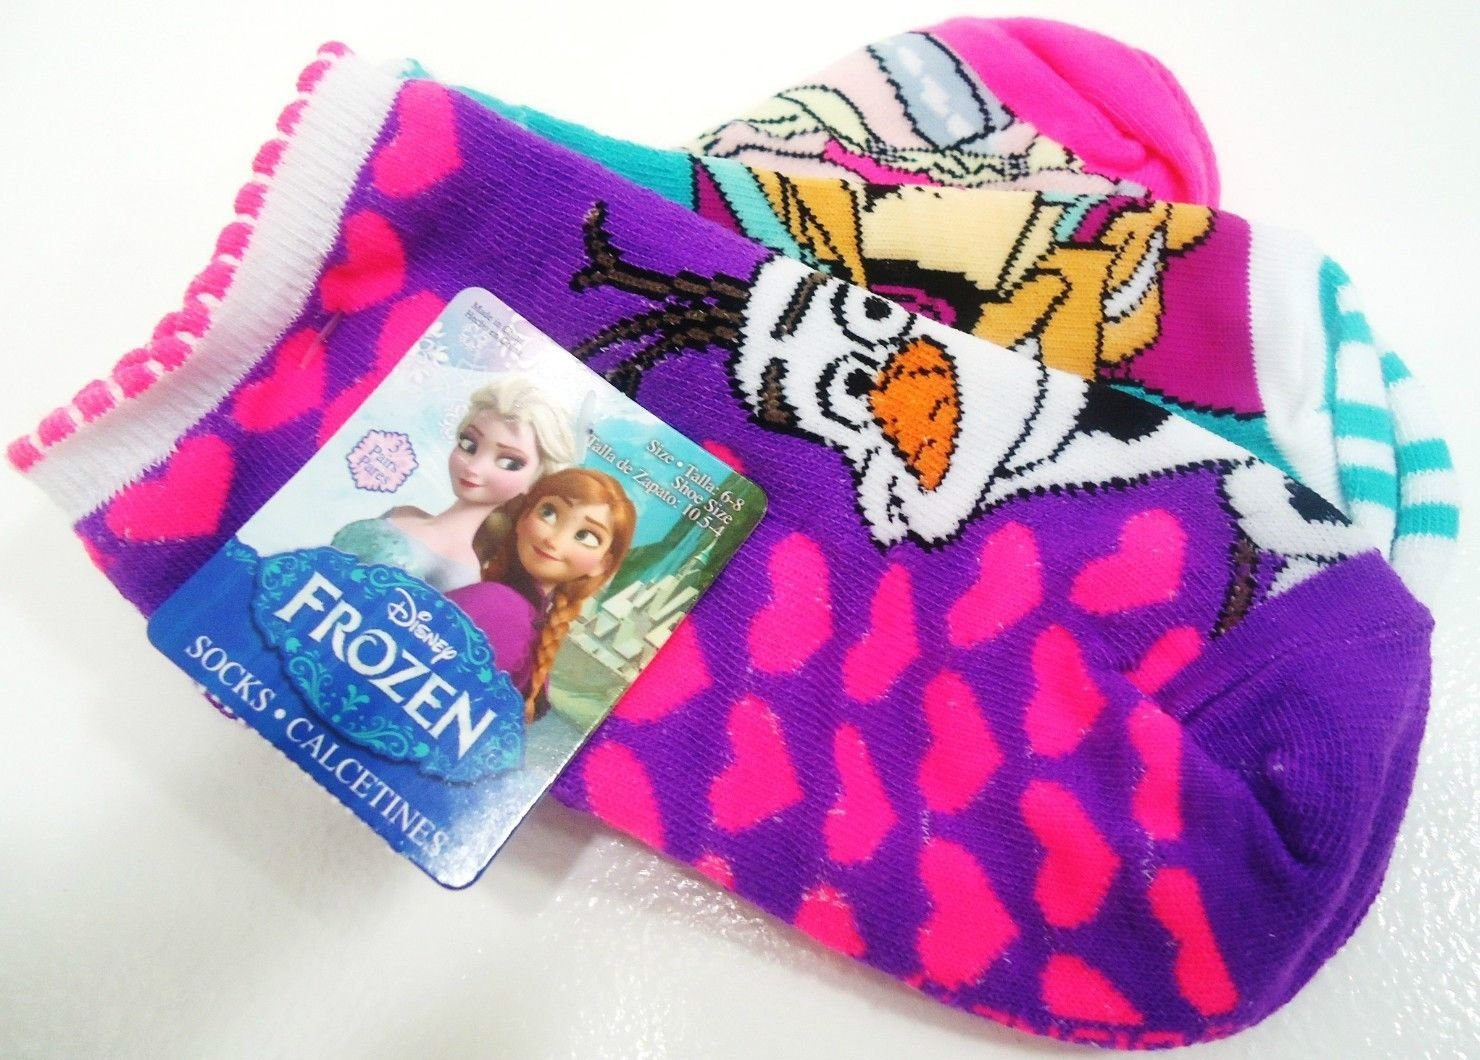 DISNEY - FROZEN - GIRL'S - (3) PACK - SOCKS - PURPLE - PINK - AQUA - BRAND NEW